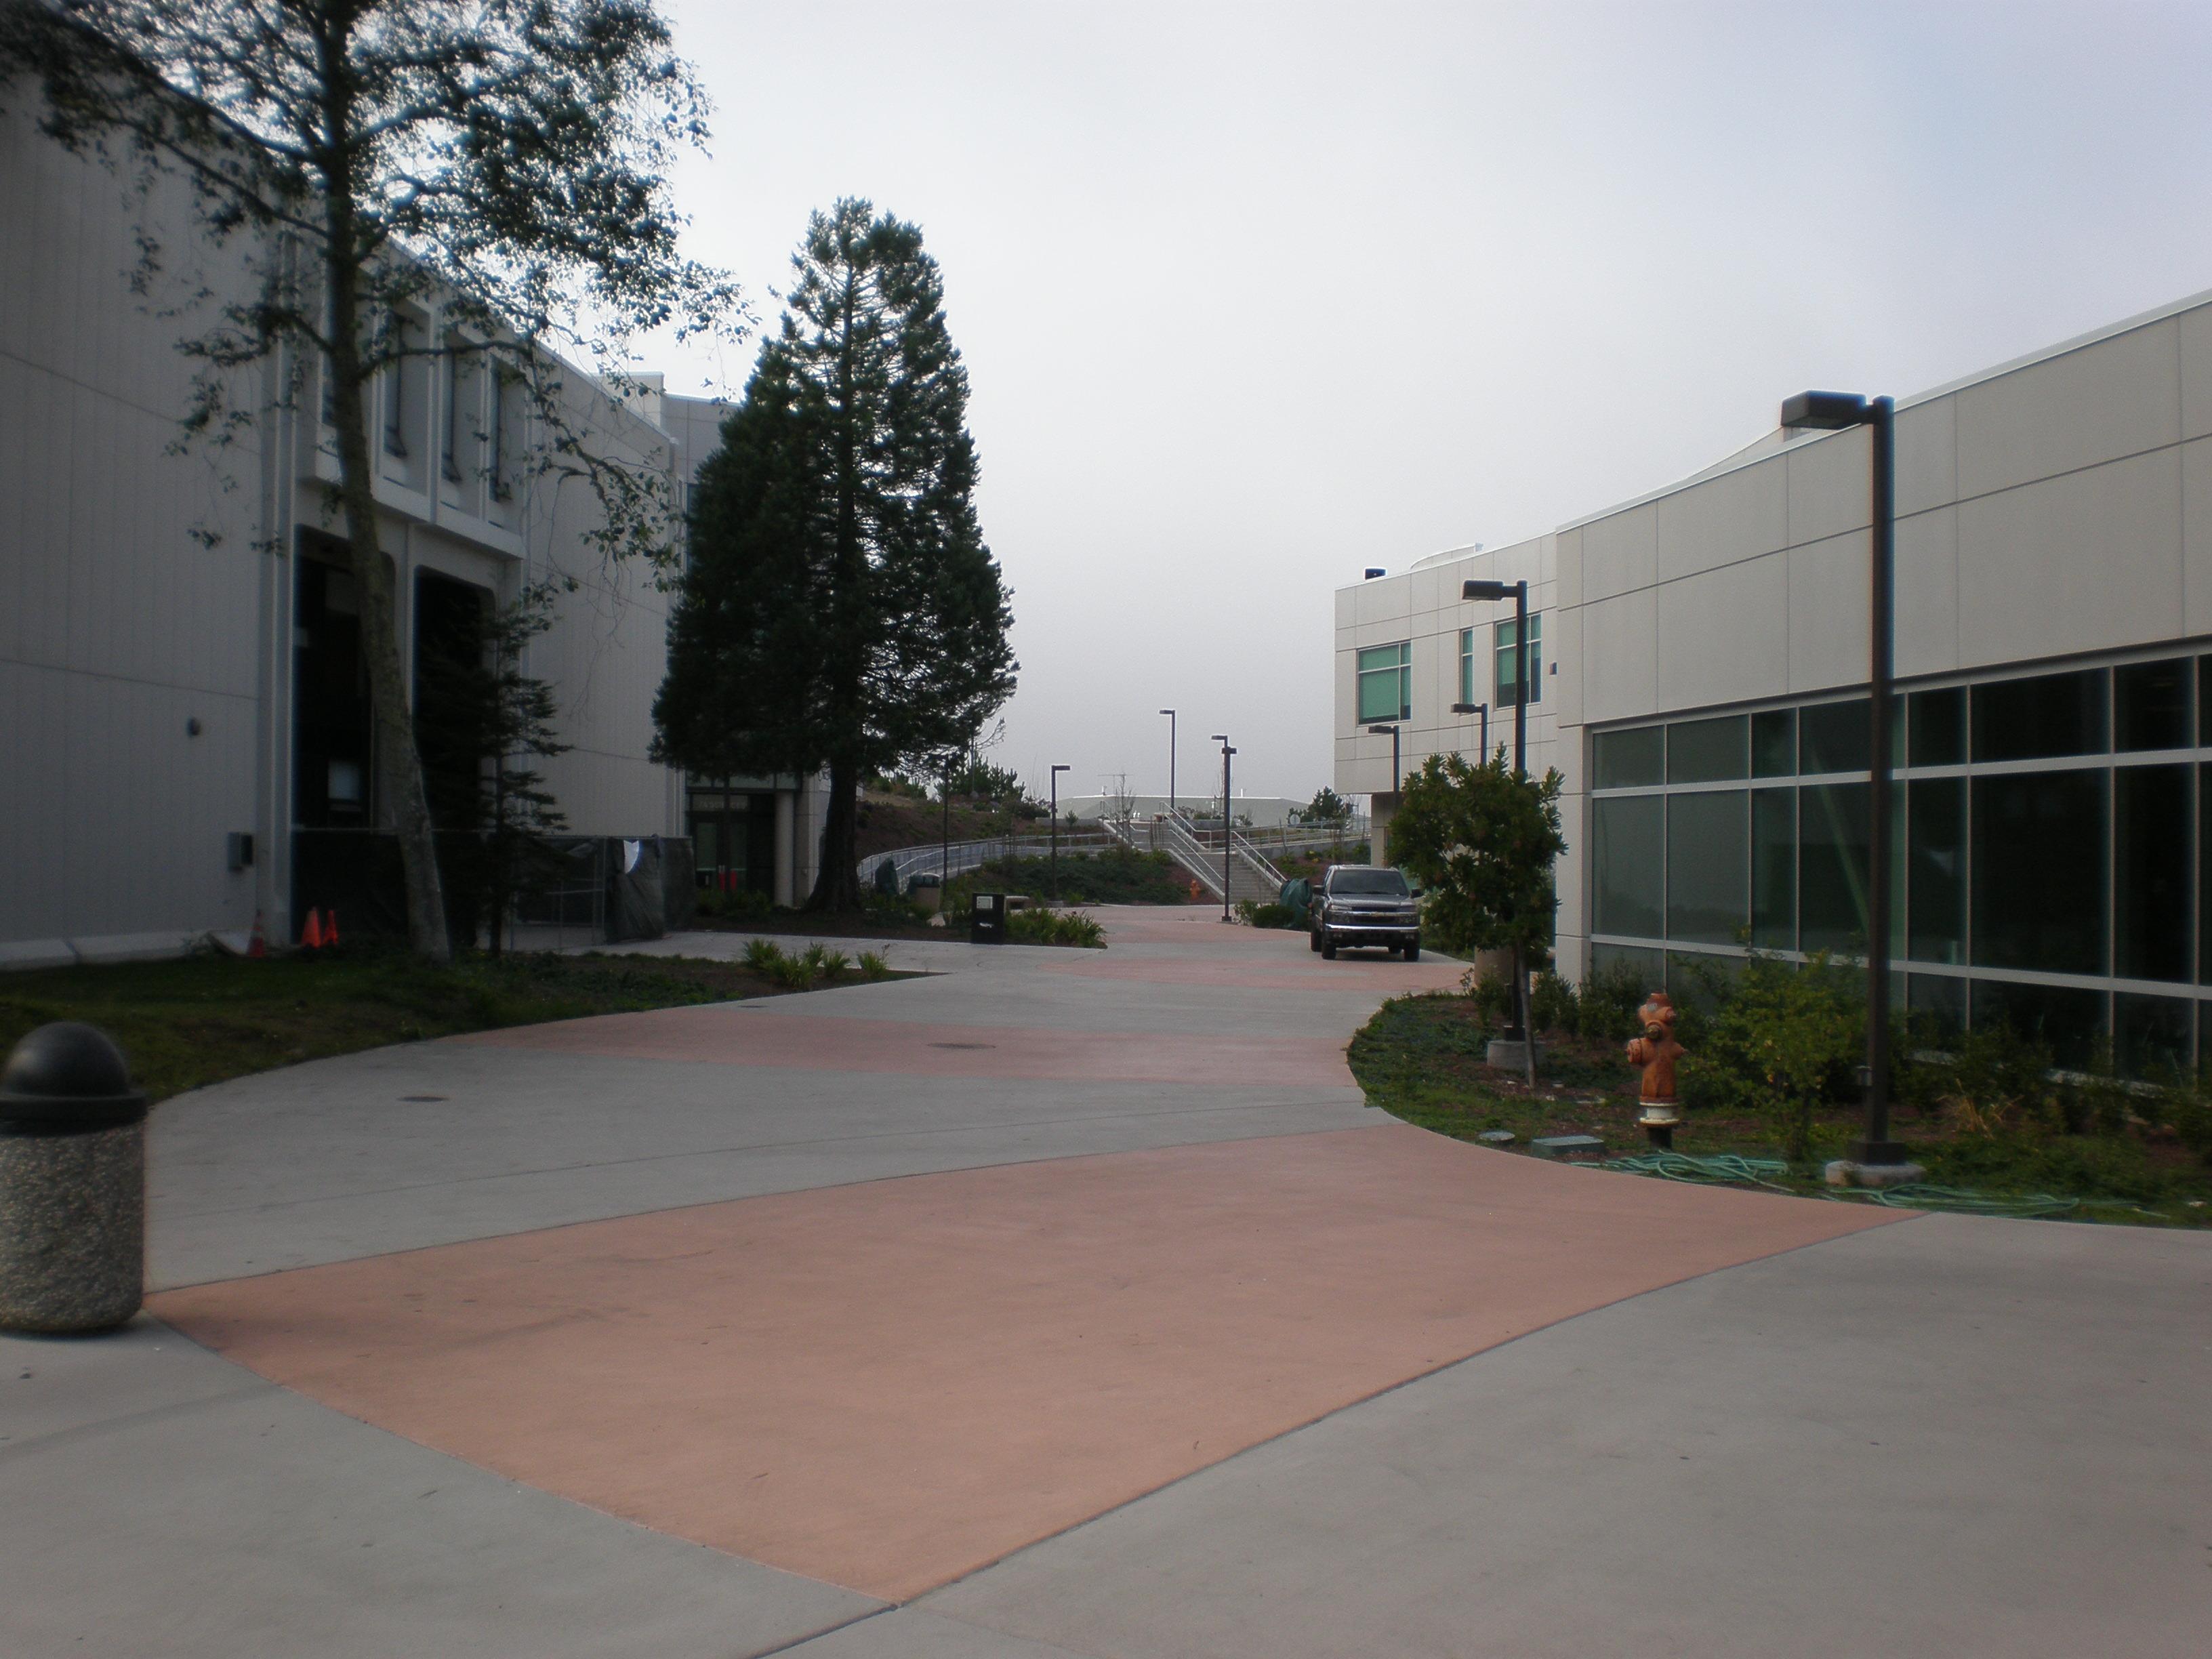 File:Skyline College Buildings 6 and 7A 2.JPG - Wikimedia ...